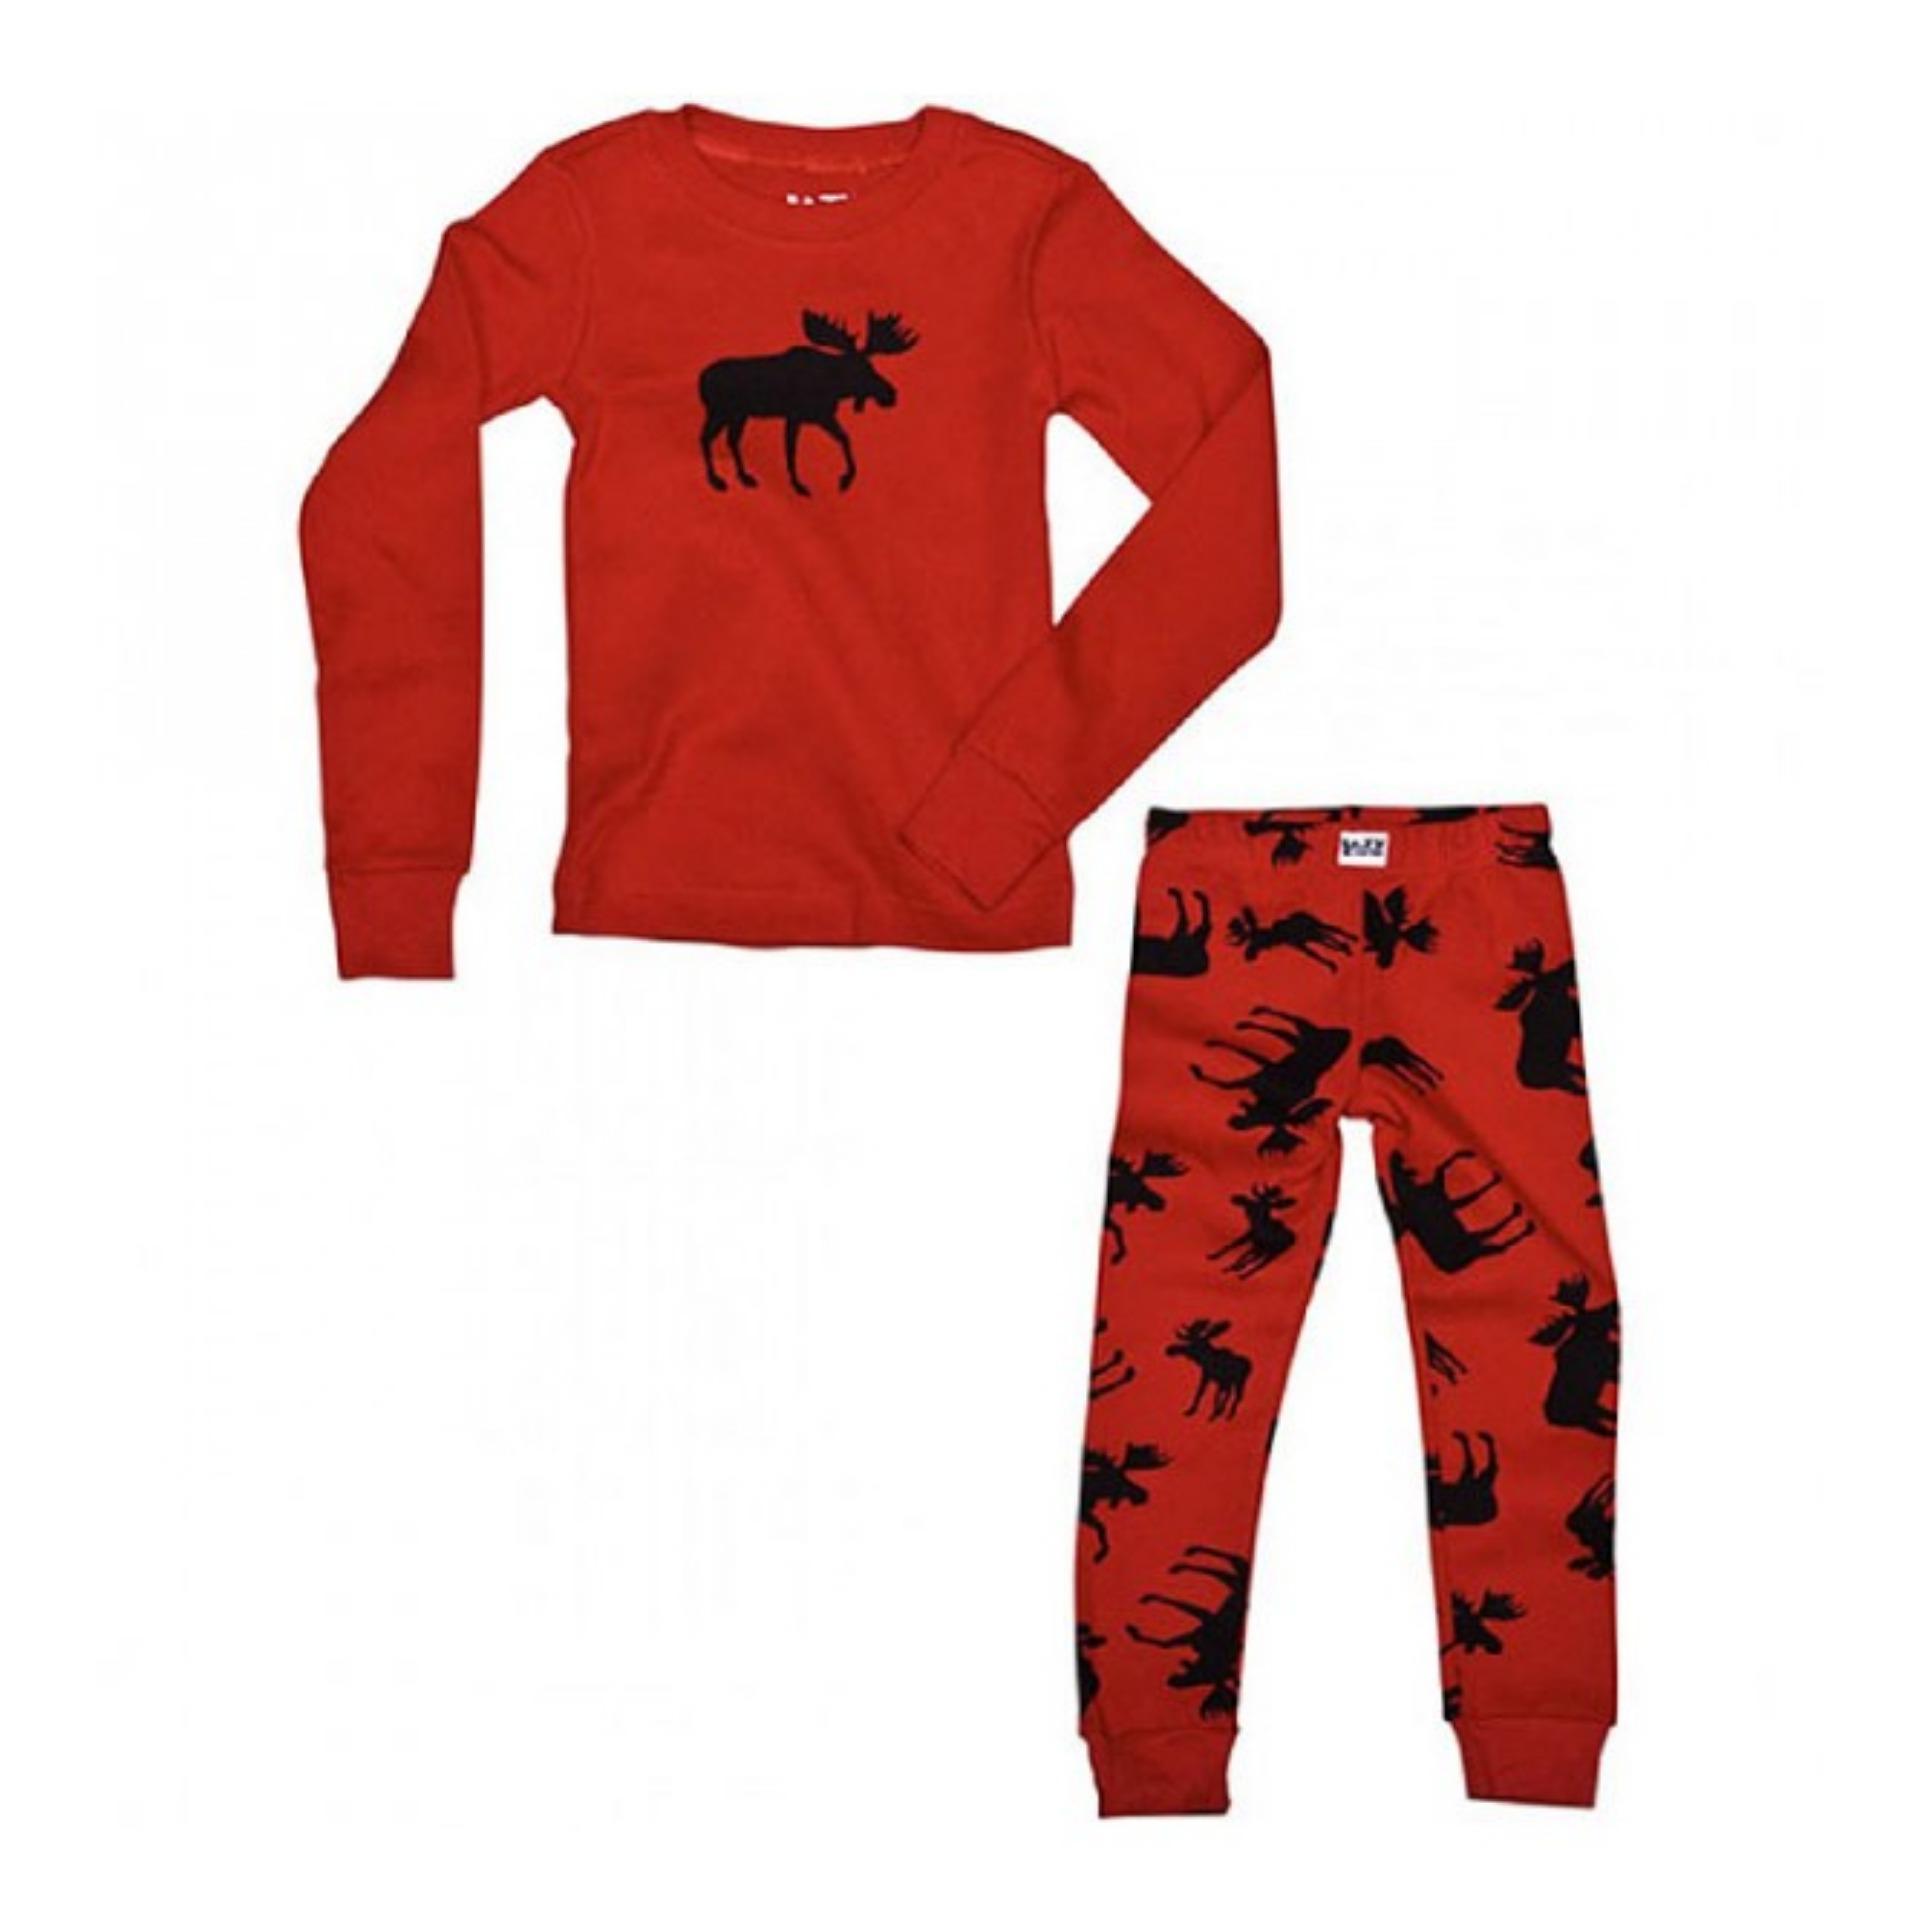 Boys Printed Snug Pyjama Sets By Espritfashions.